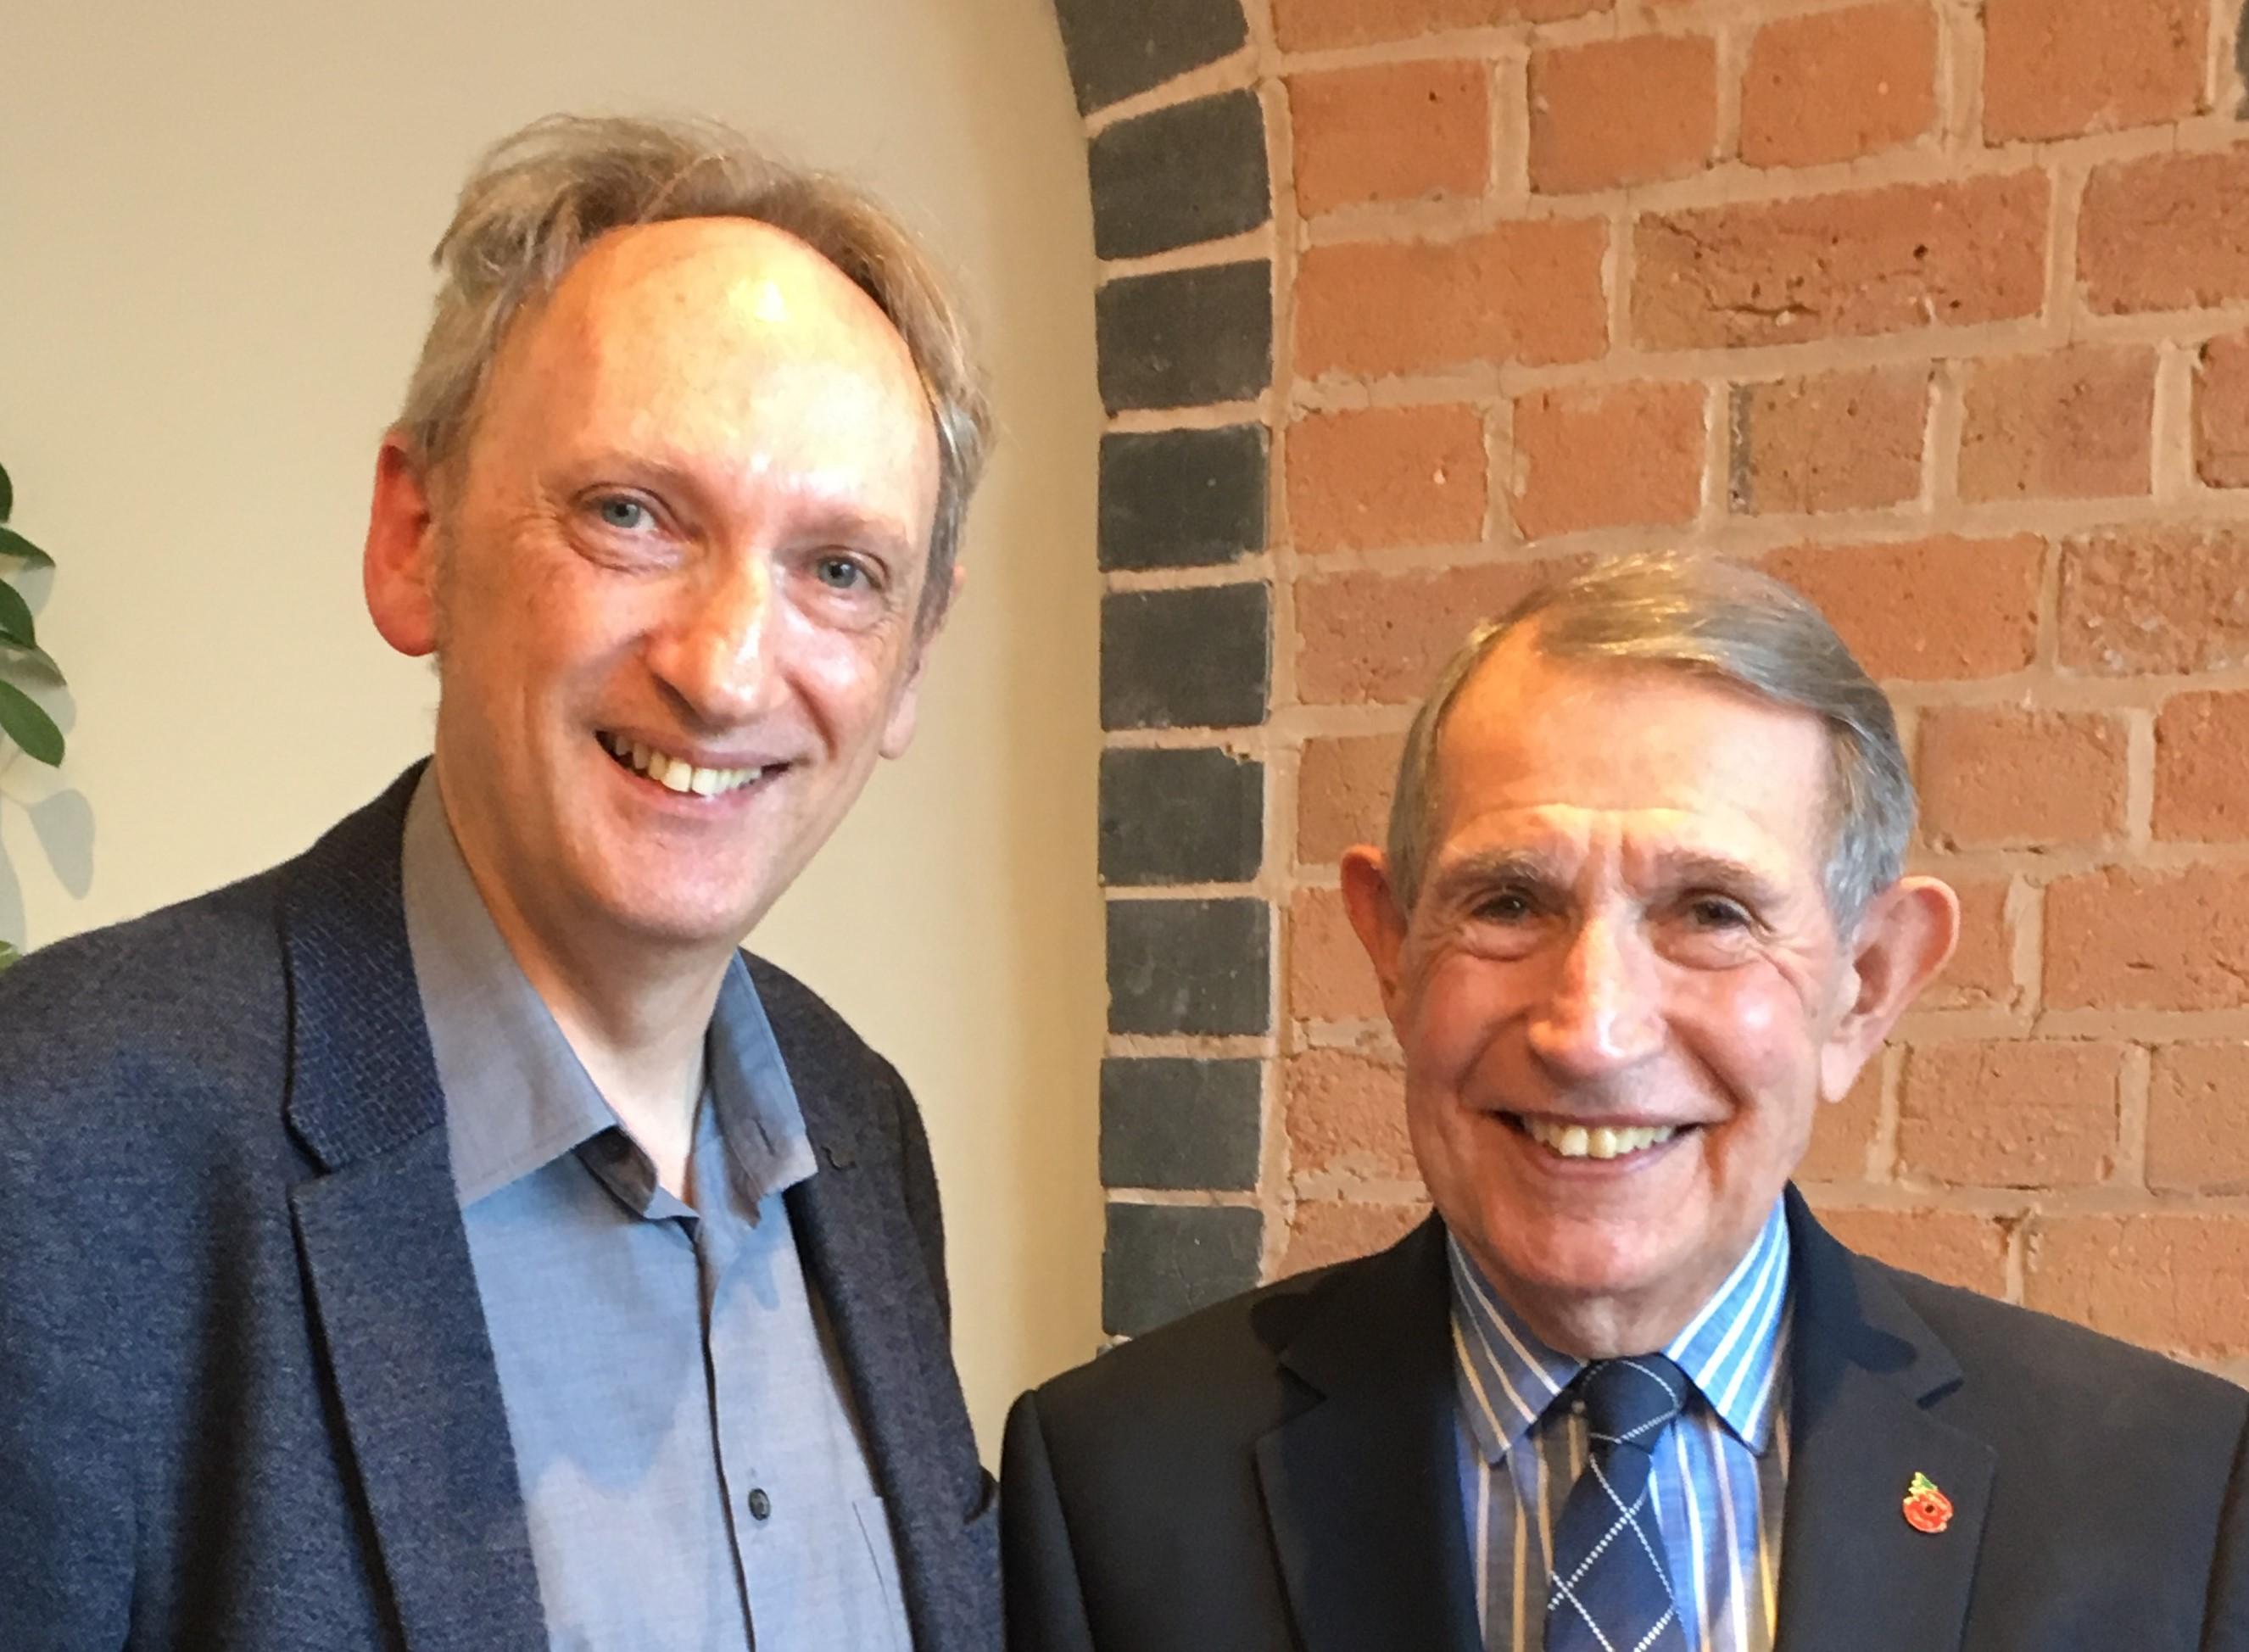 Professor Malcolm McDonald and Edmund Bradford